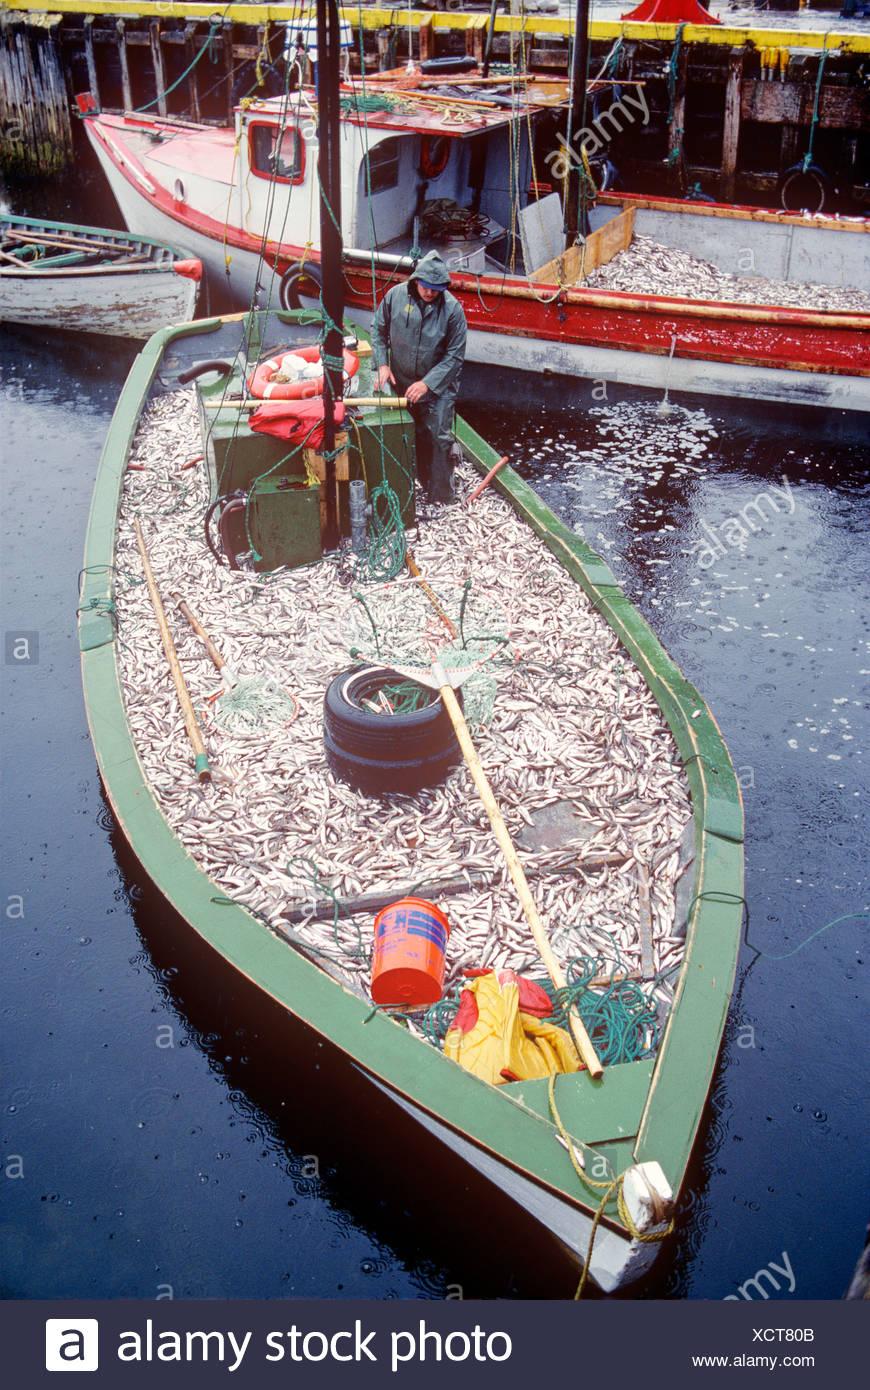 fishing boat full of capelin, Cape Broyle, Newfoundland, Canada - Stock Image